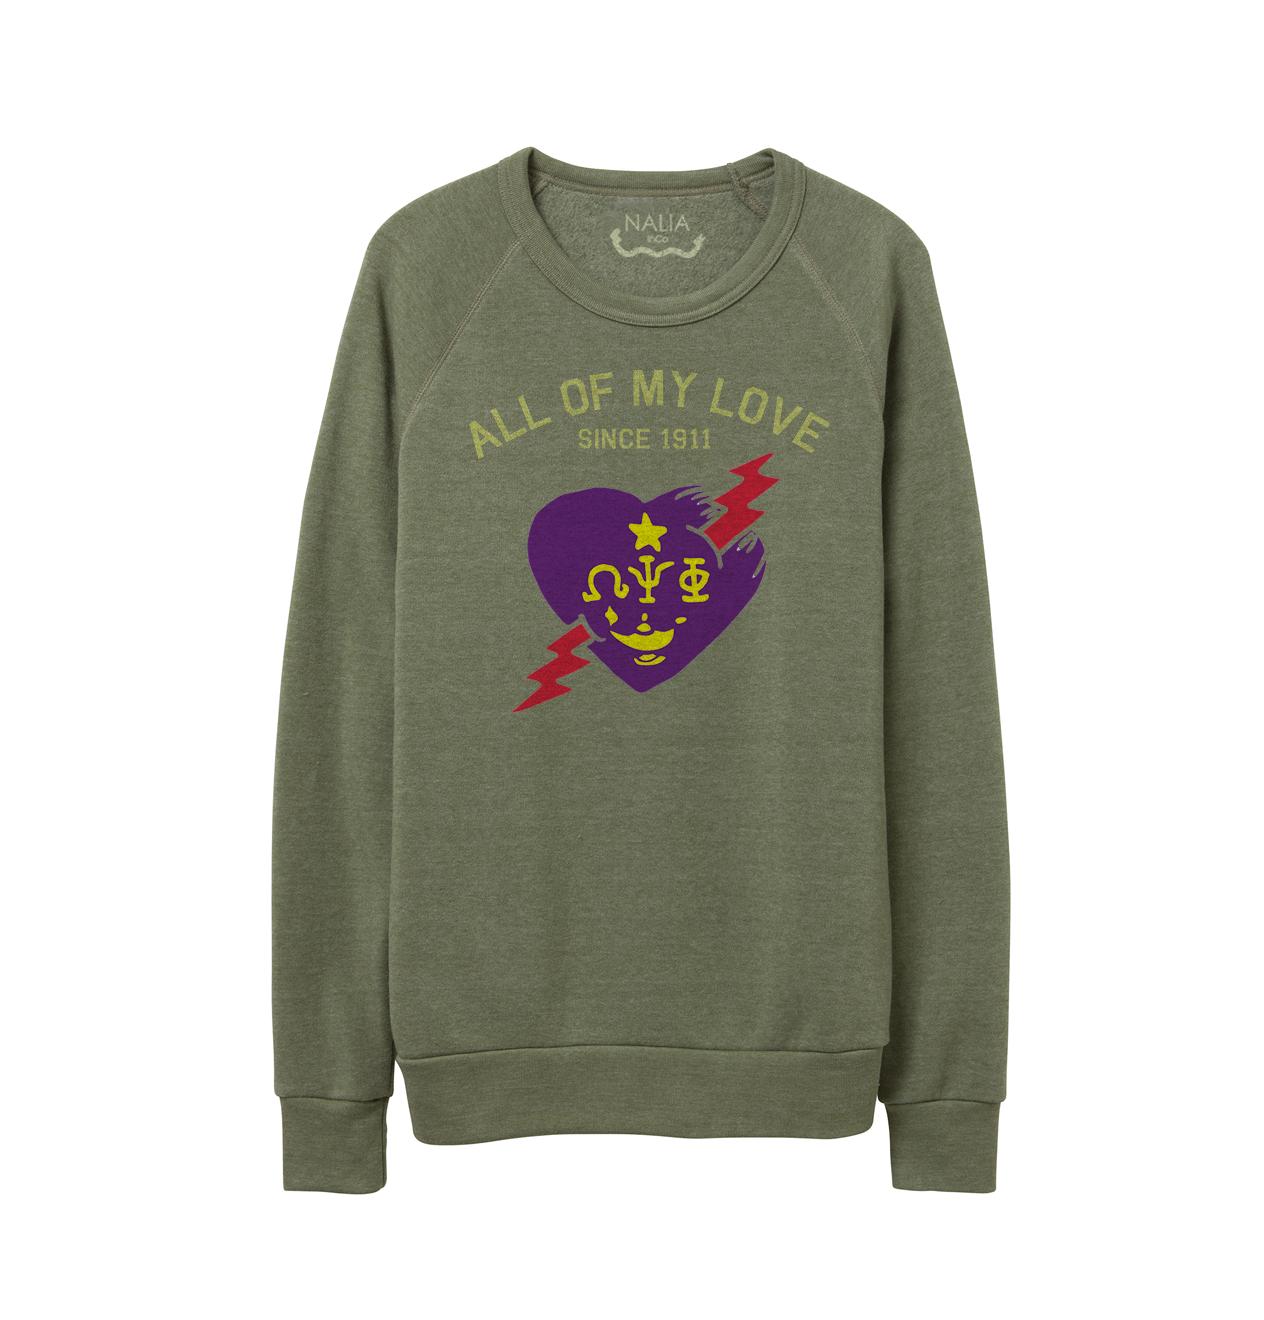 All-of-my-love-sweatshirt.png